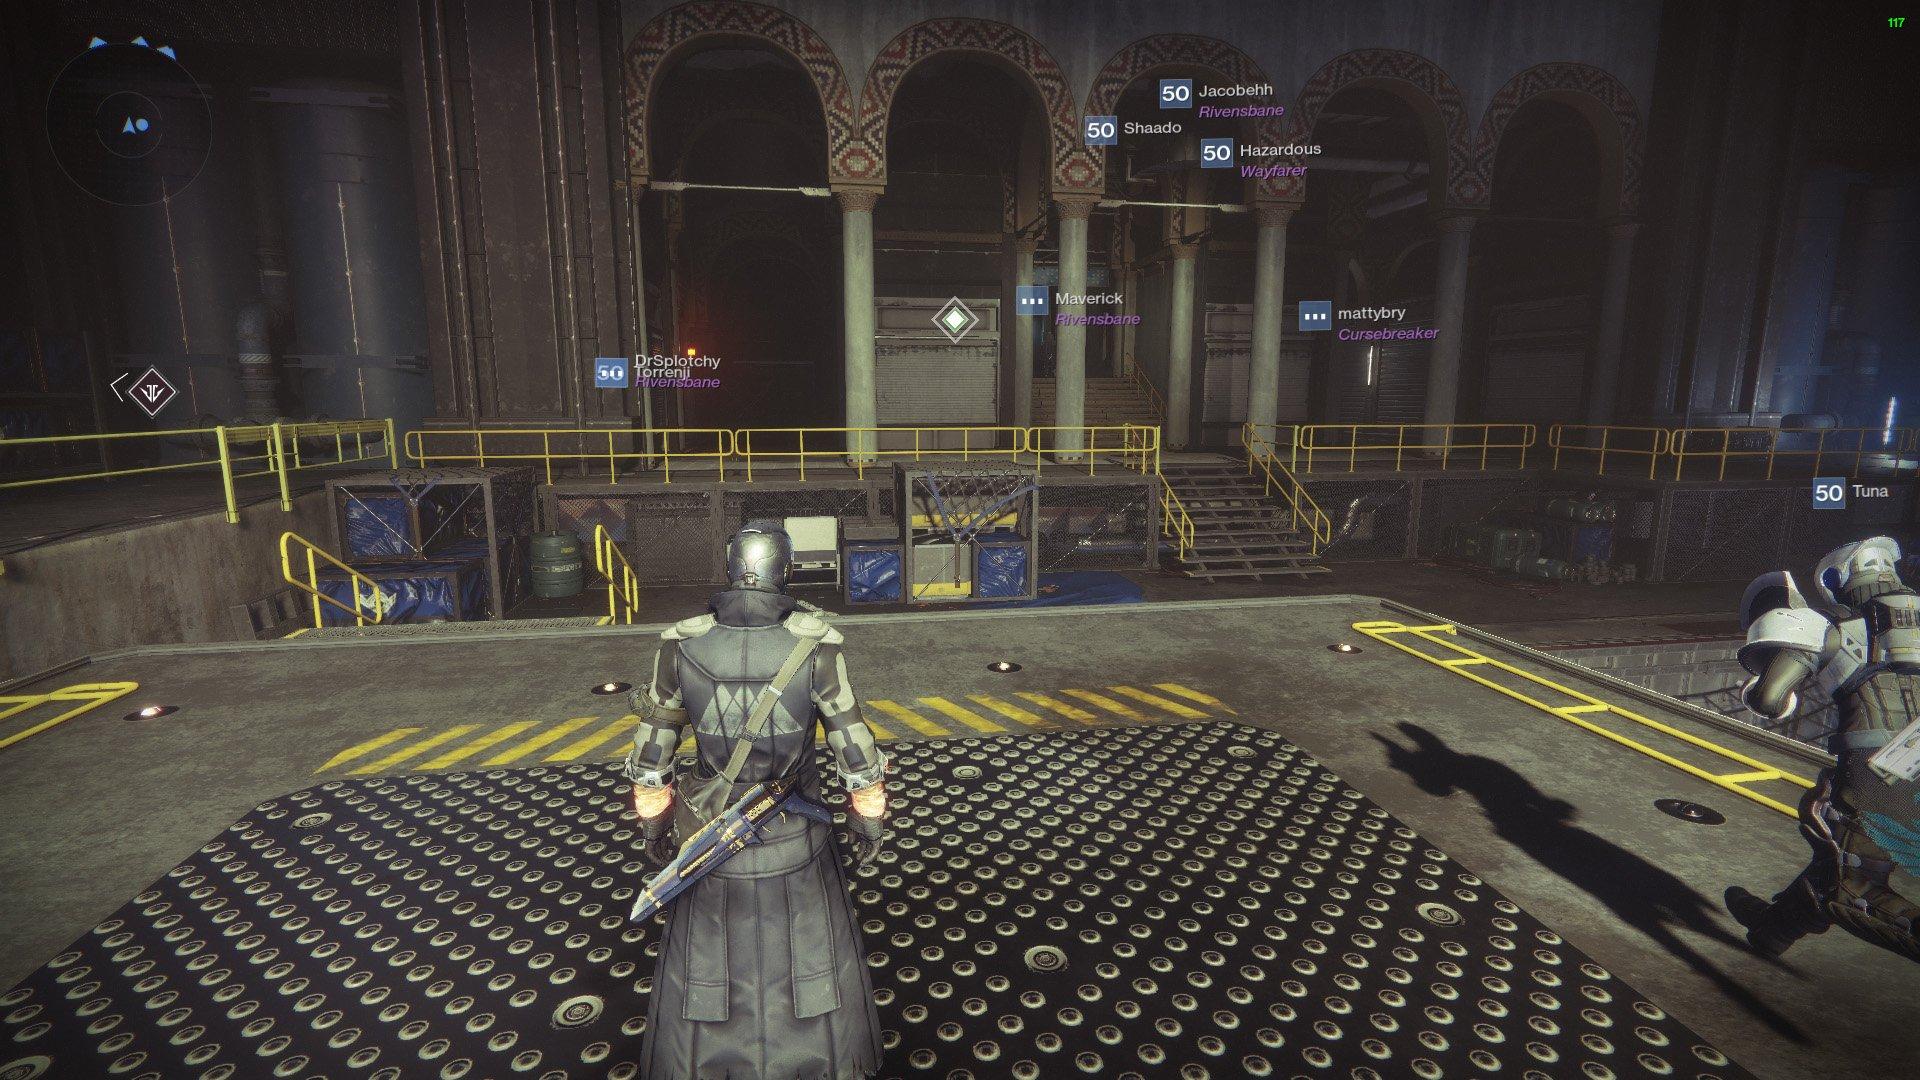 Destiny 2 where to find Benedict 99-40